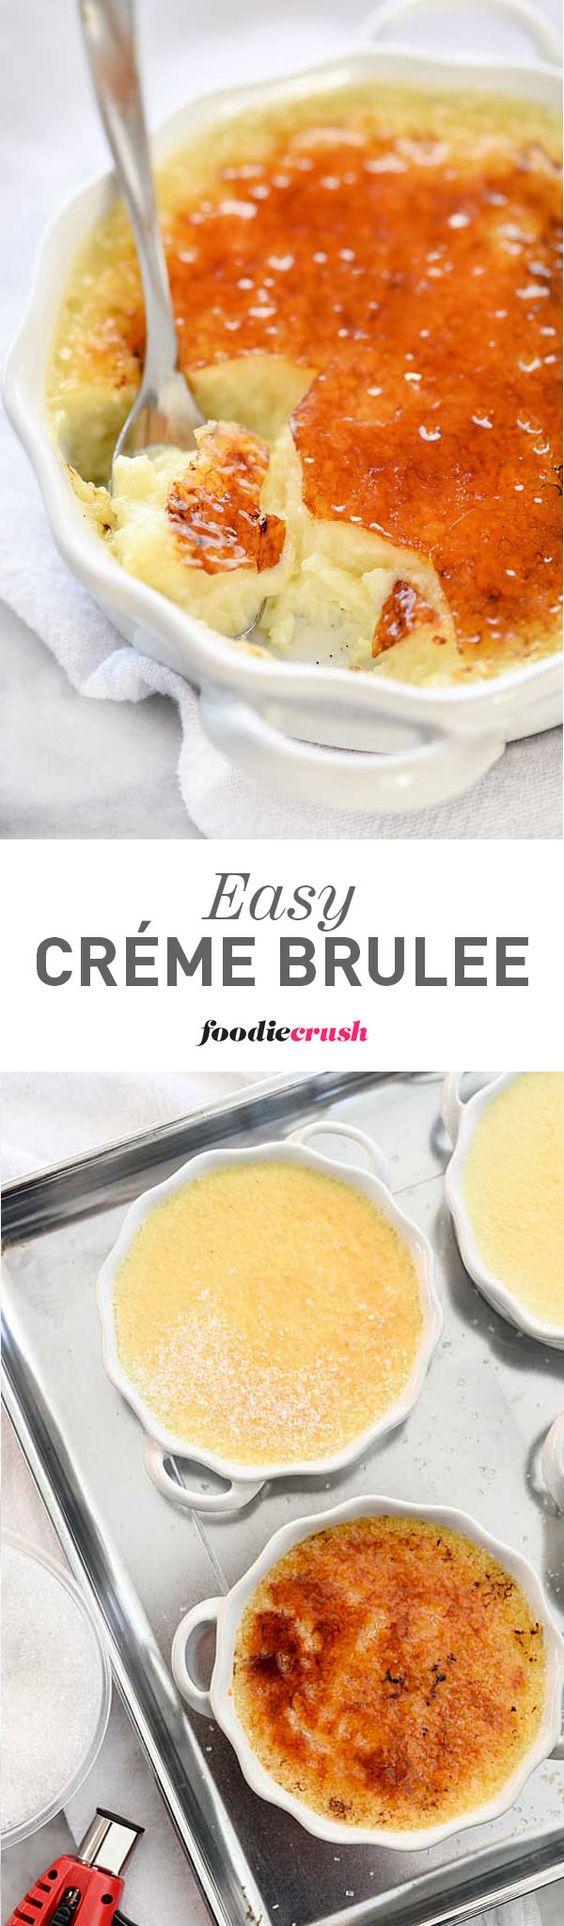 brulee basic creme brulee recipe the blue elephants basic creme brulee ...